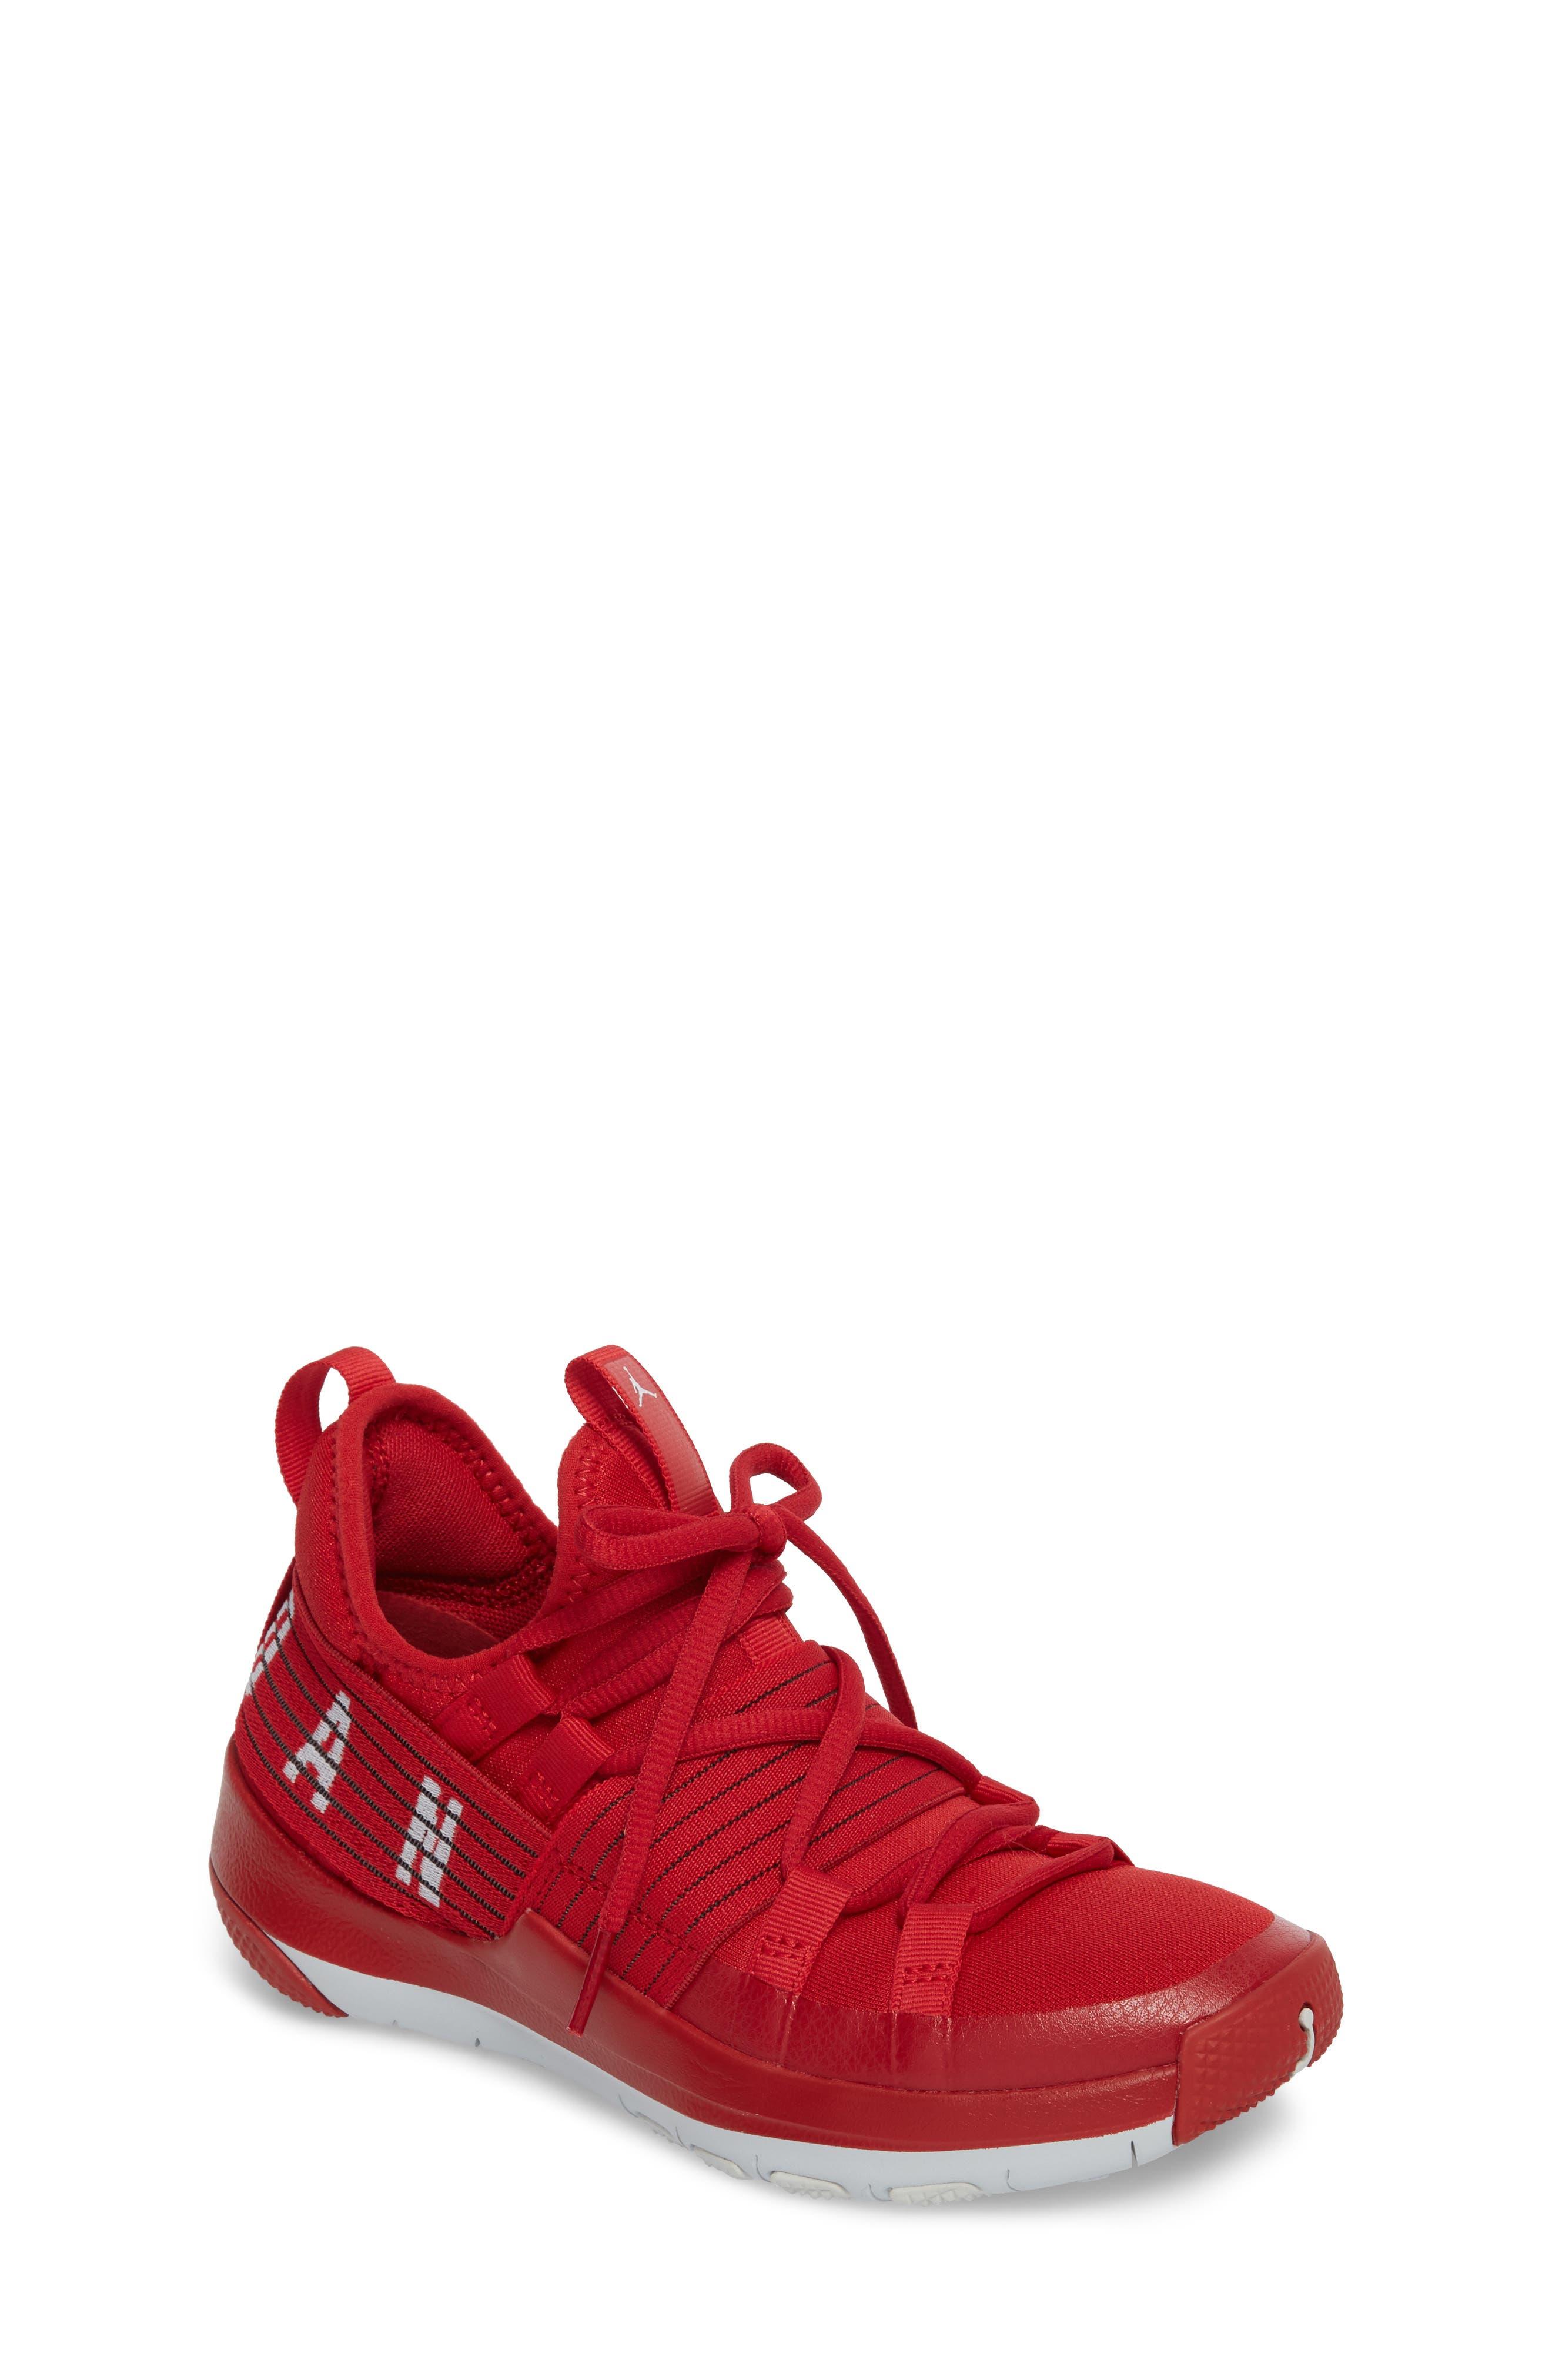 Trainer Pro Training Shoe,                             Main thumbnail 1, color,